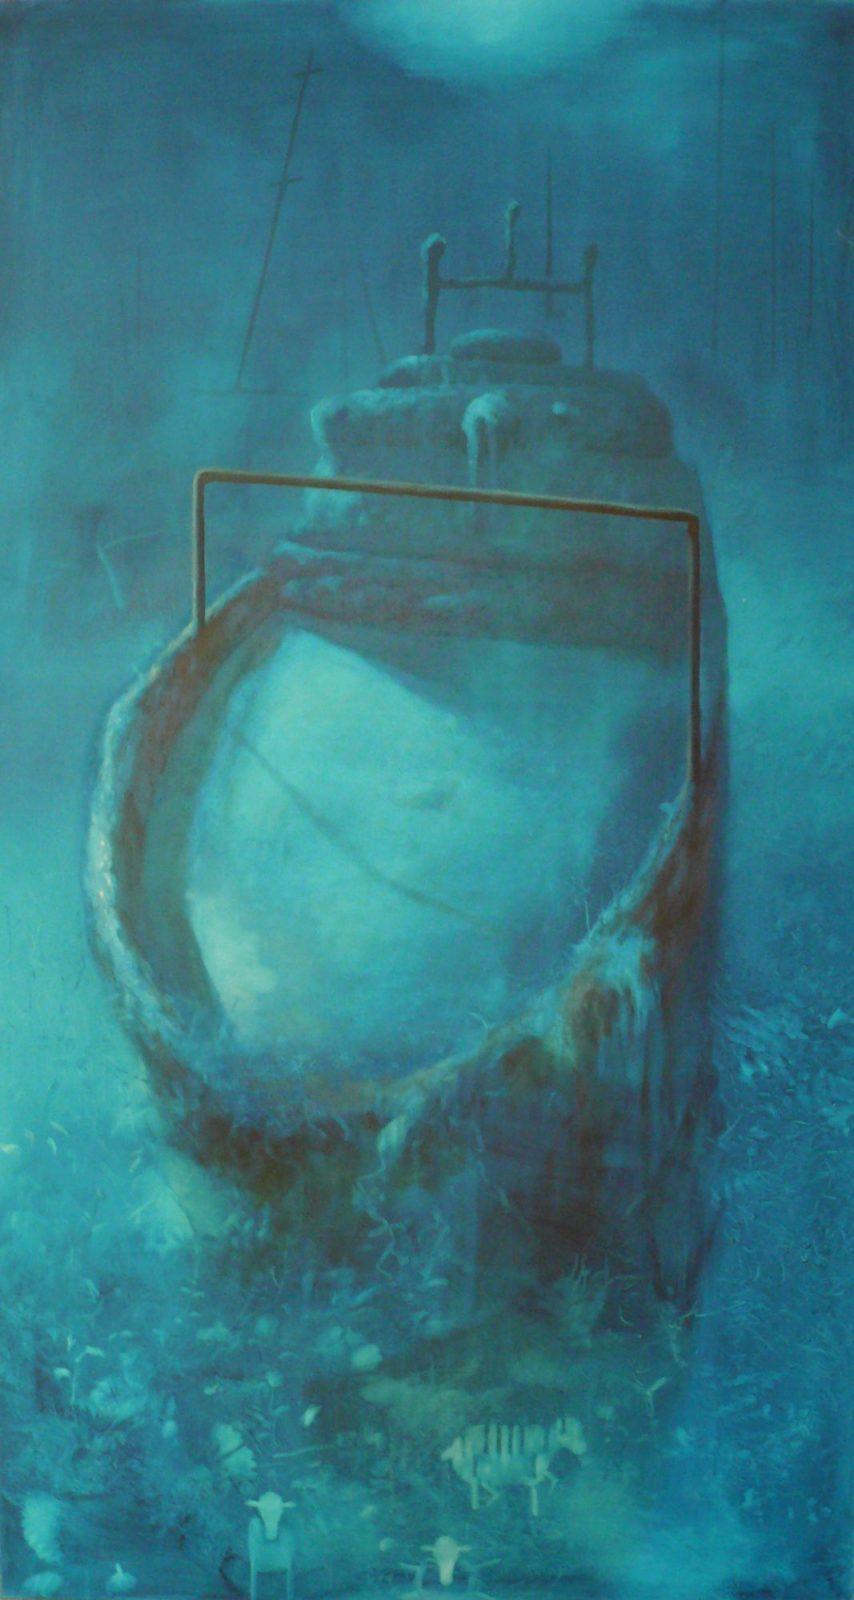 Herman Levente: Noé bárkája – Water